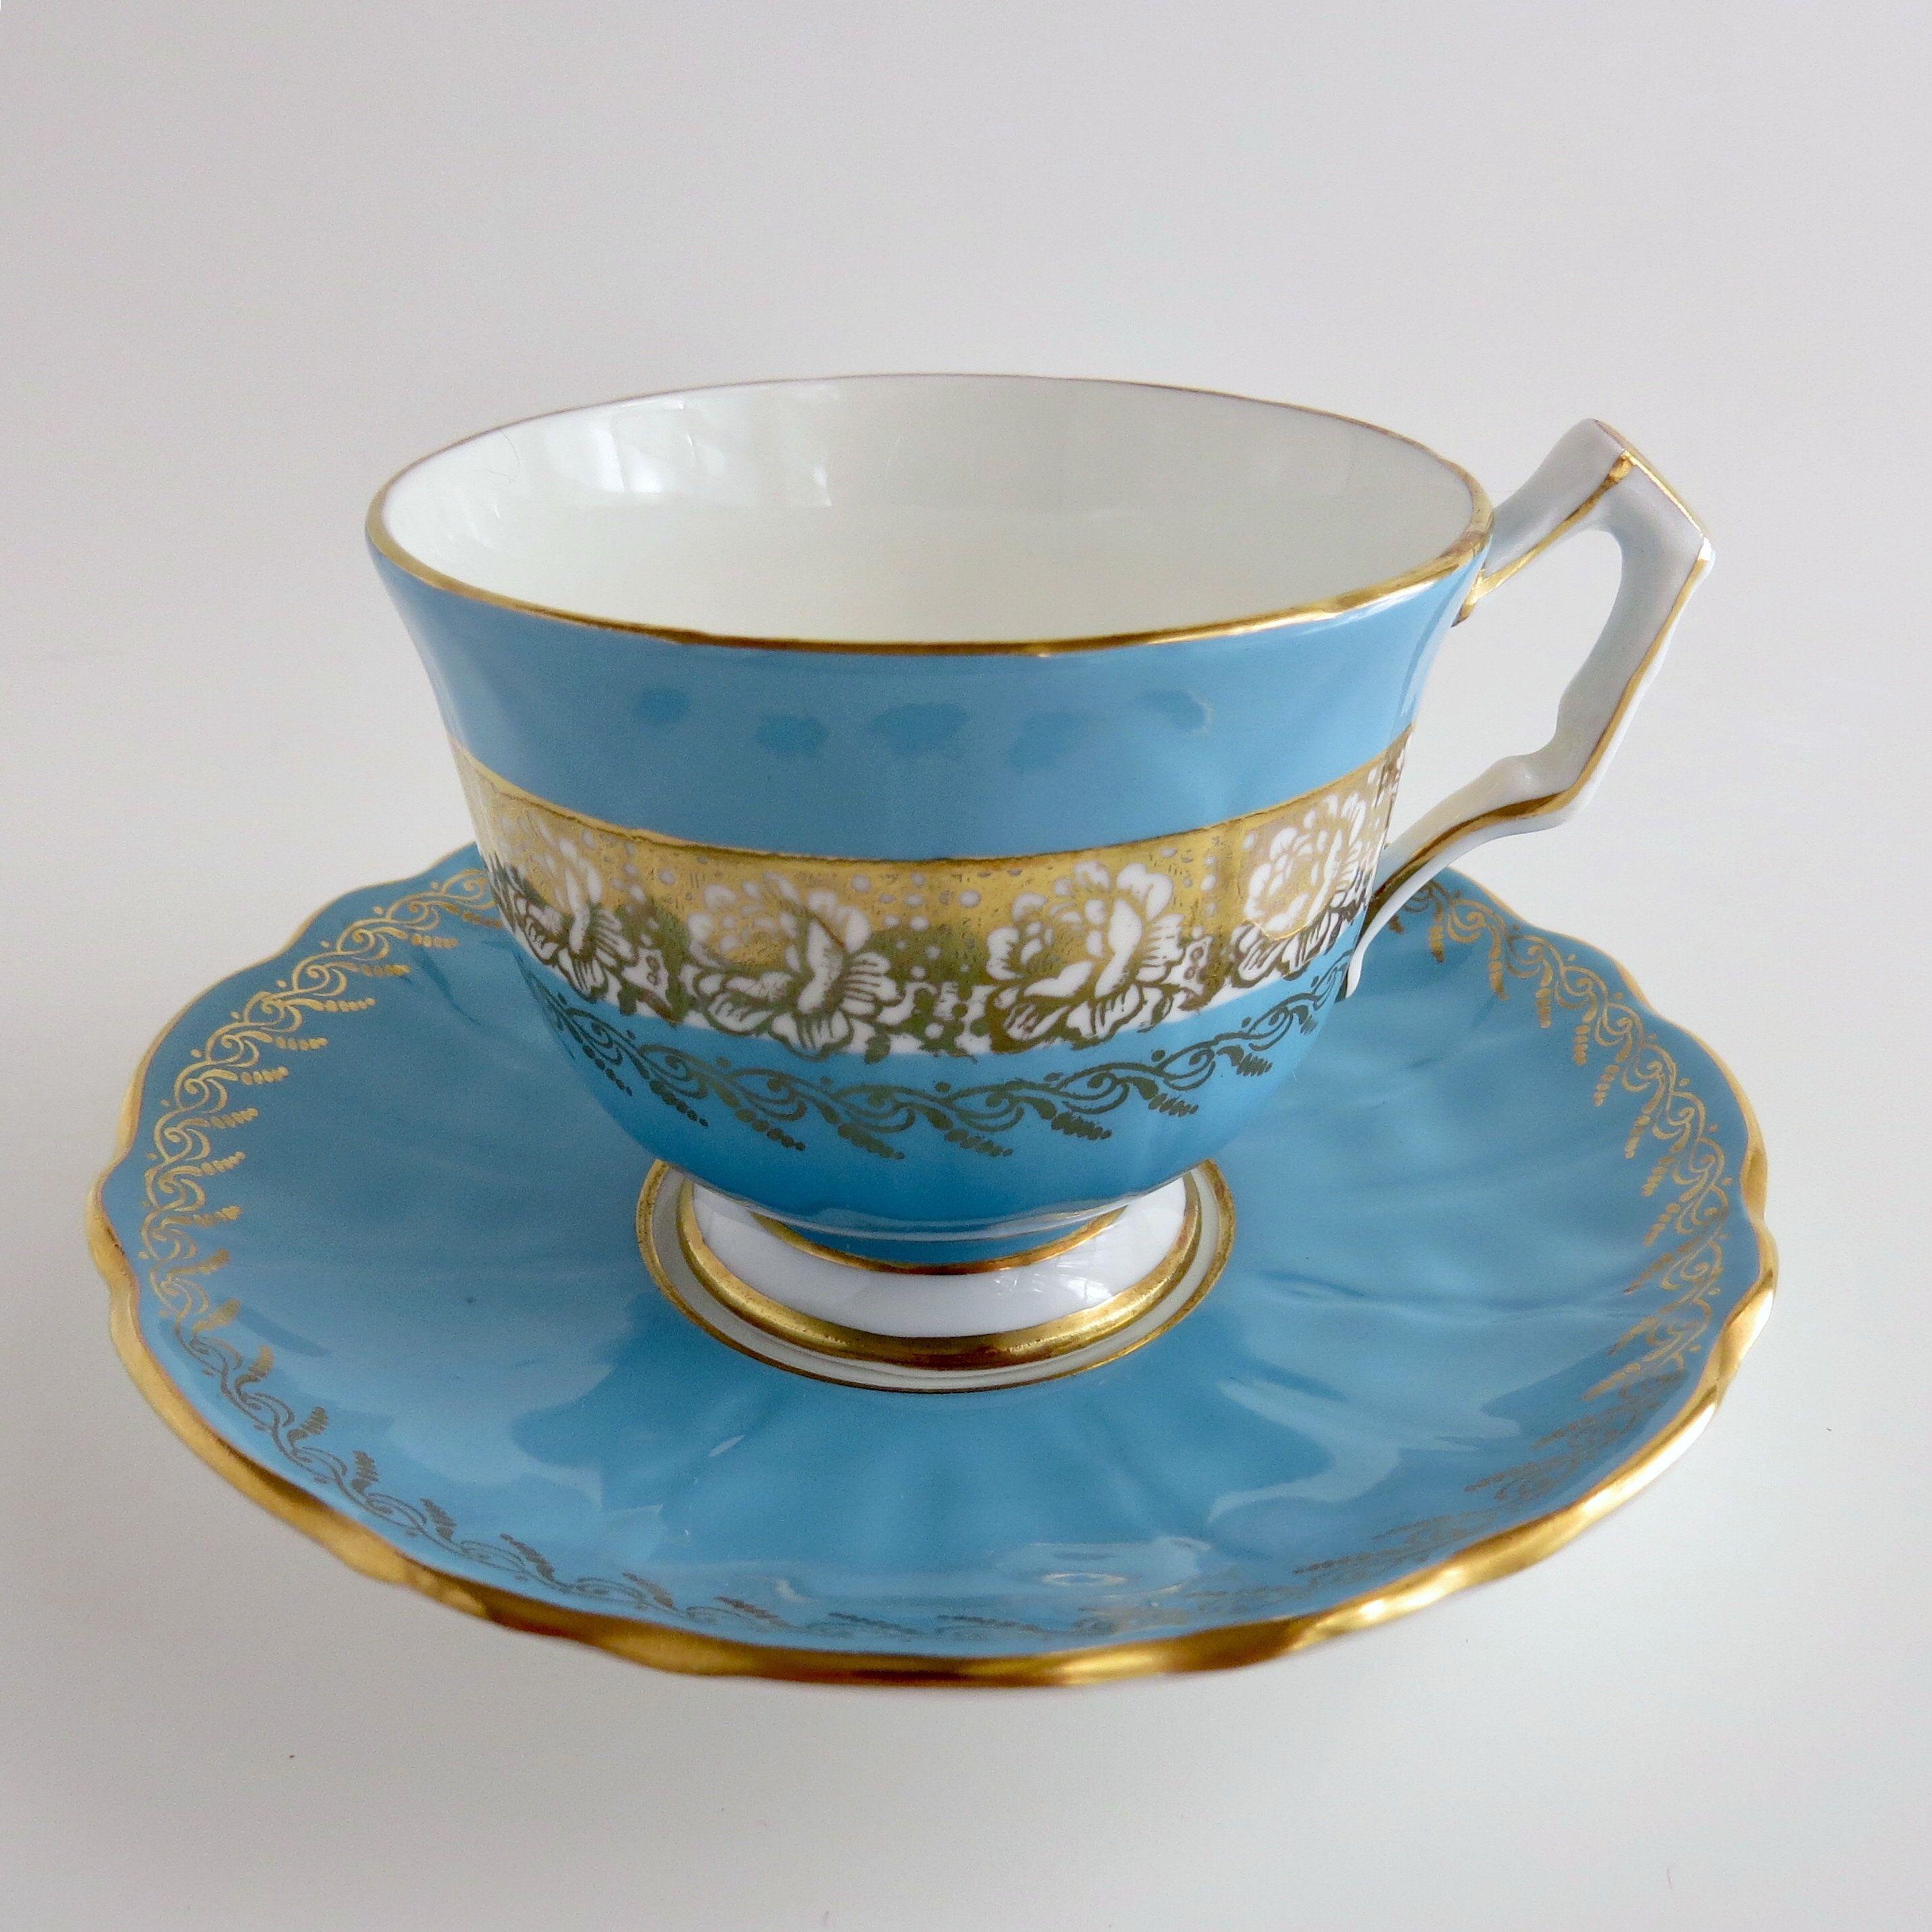 Aynsley Blue and Gold Tea Cup and Saucer Set, Crocus Shape, Pattern 2932, Vintage Fine English Bone China #teacups